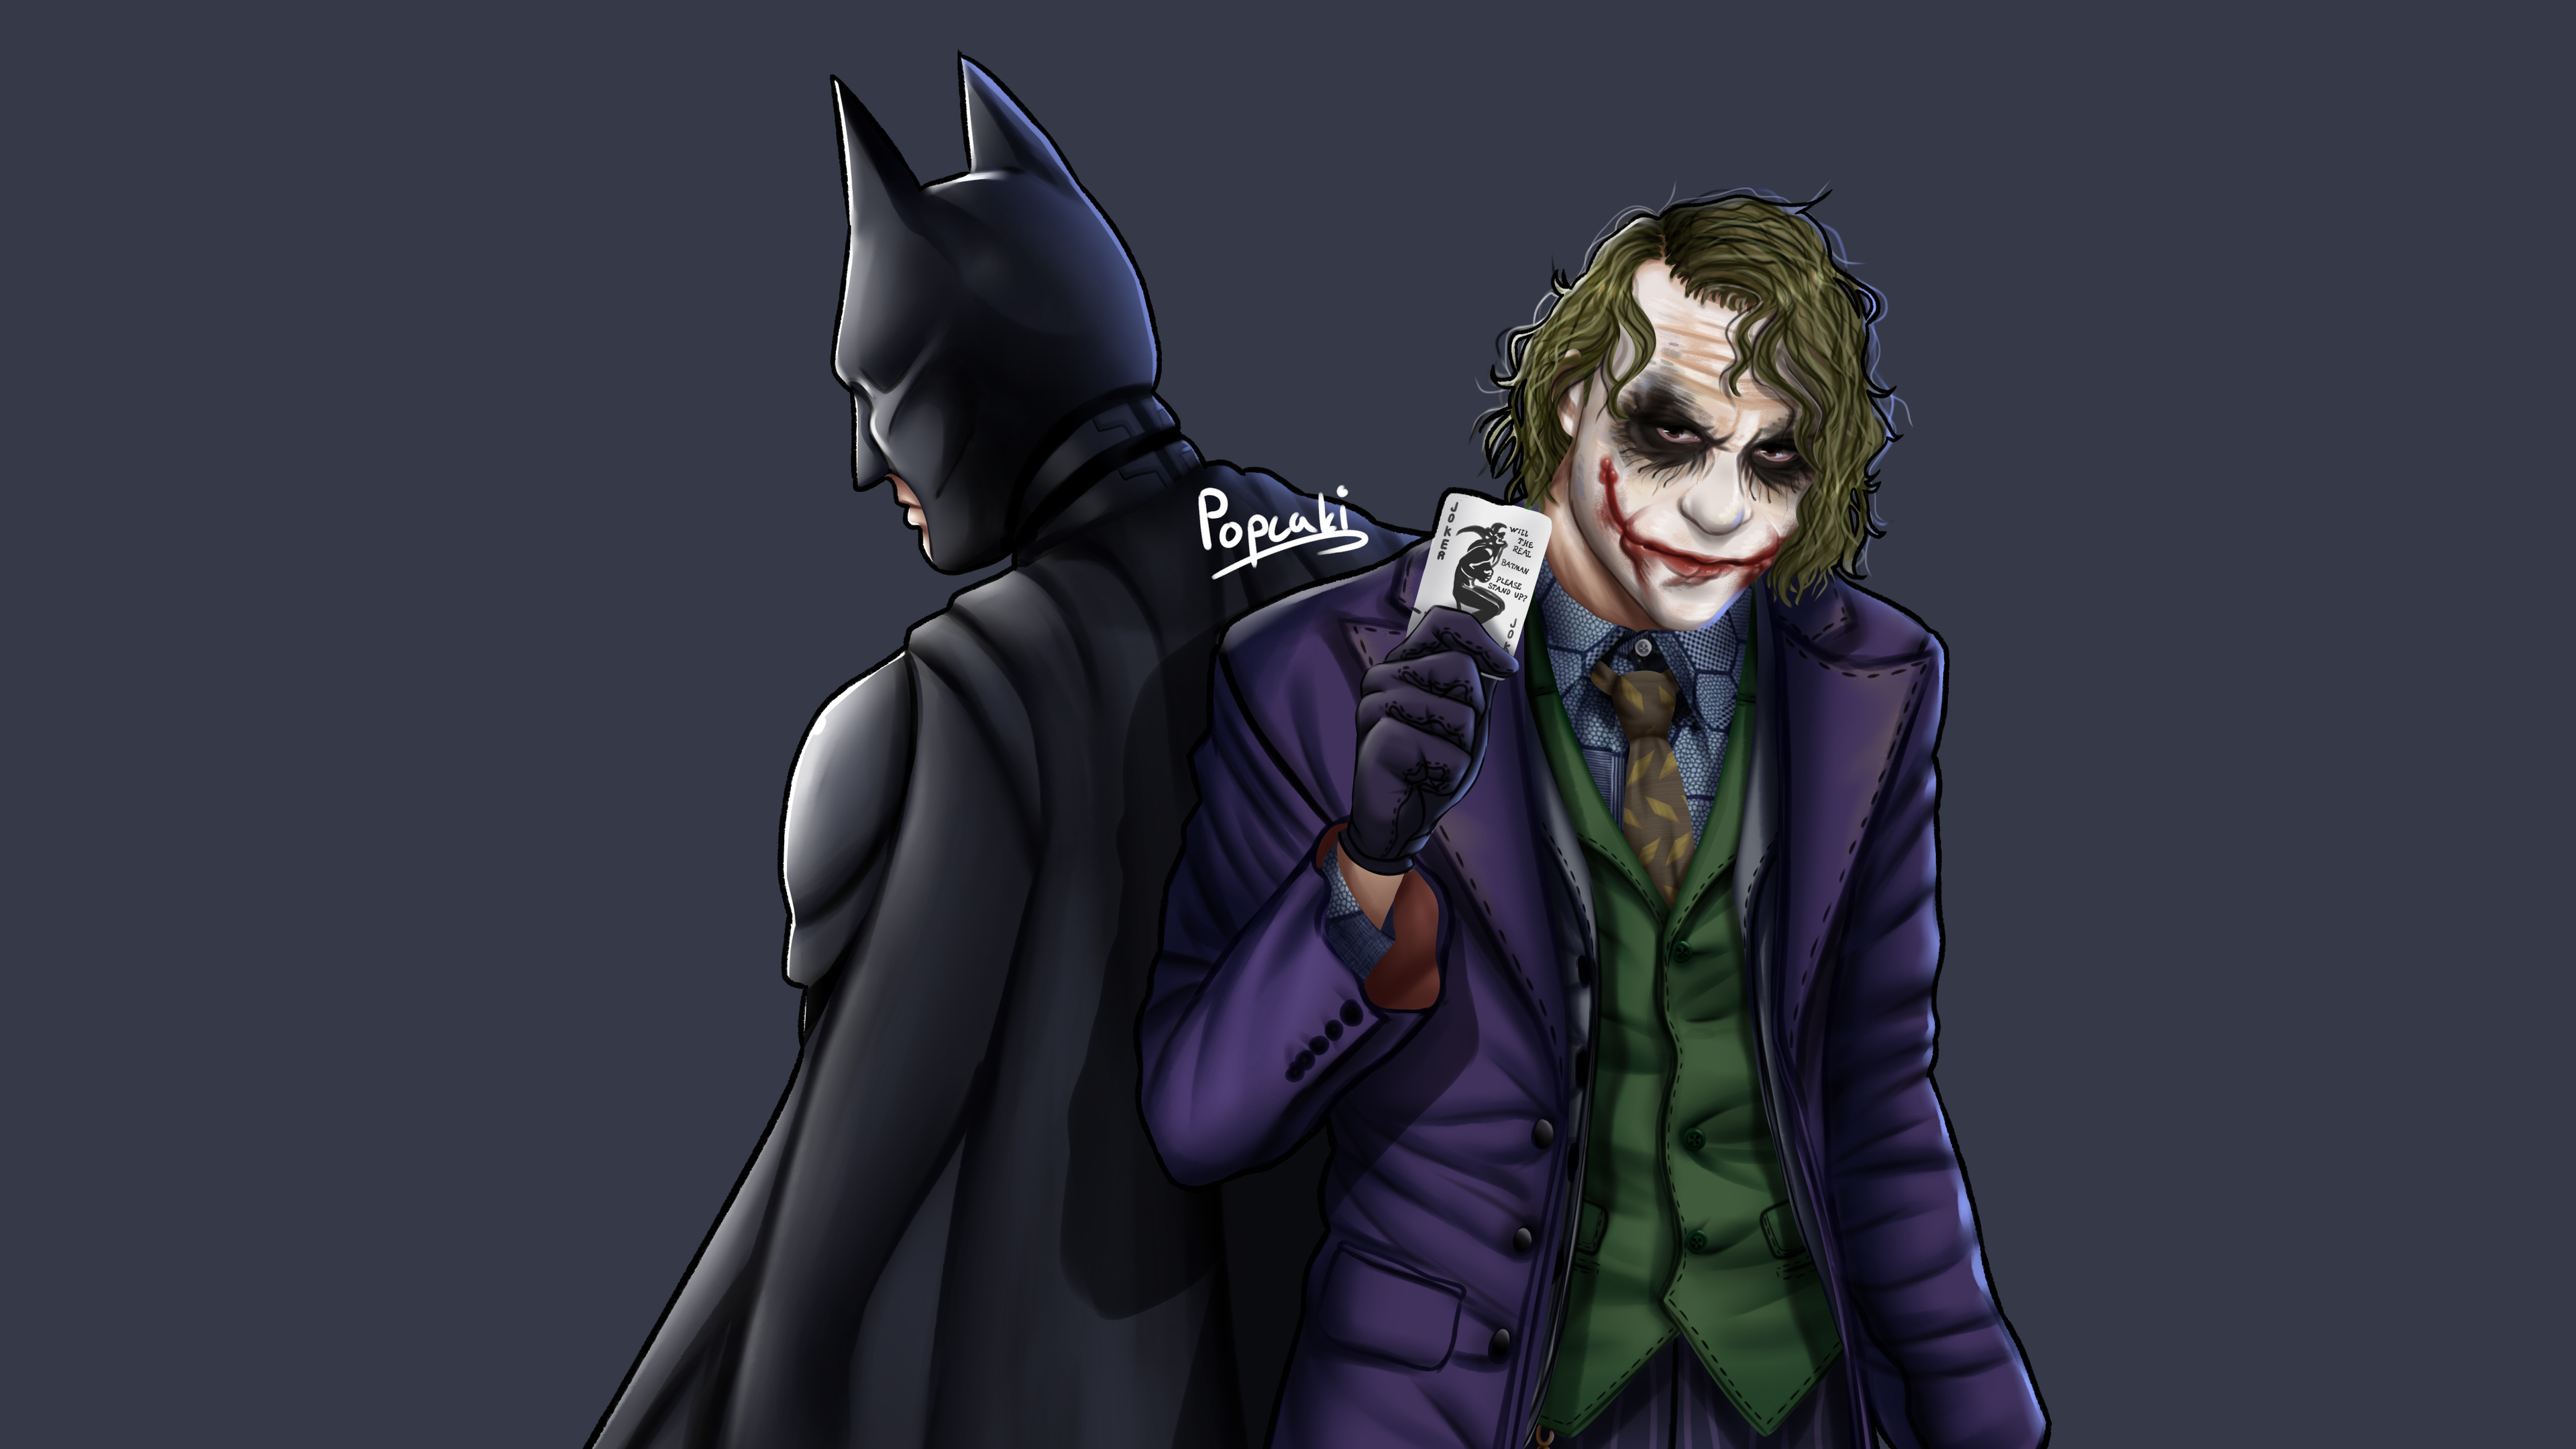 Wallpaper 4k Joker Batman Art 4k 4k Wallpapers 5k